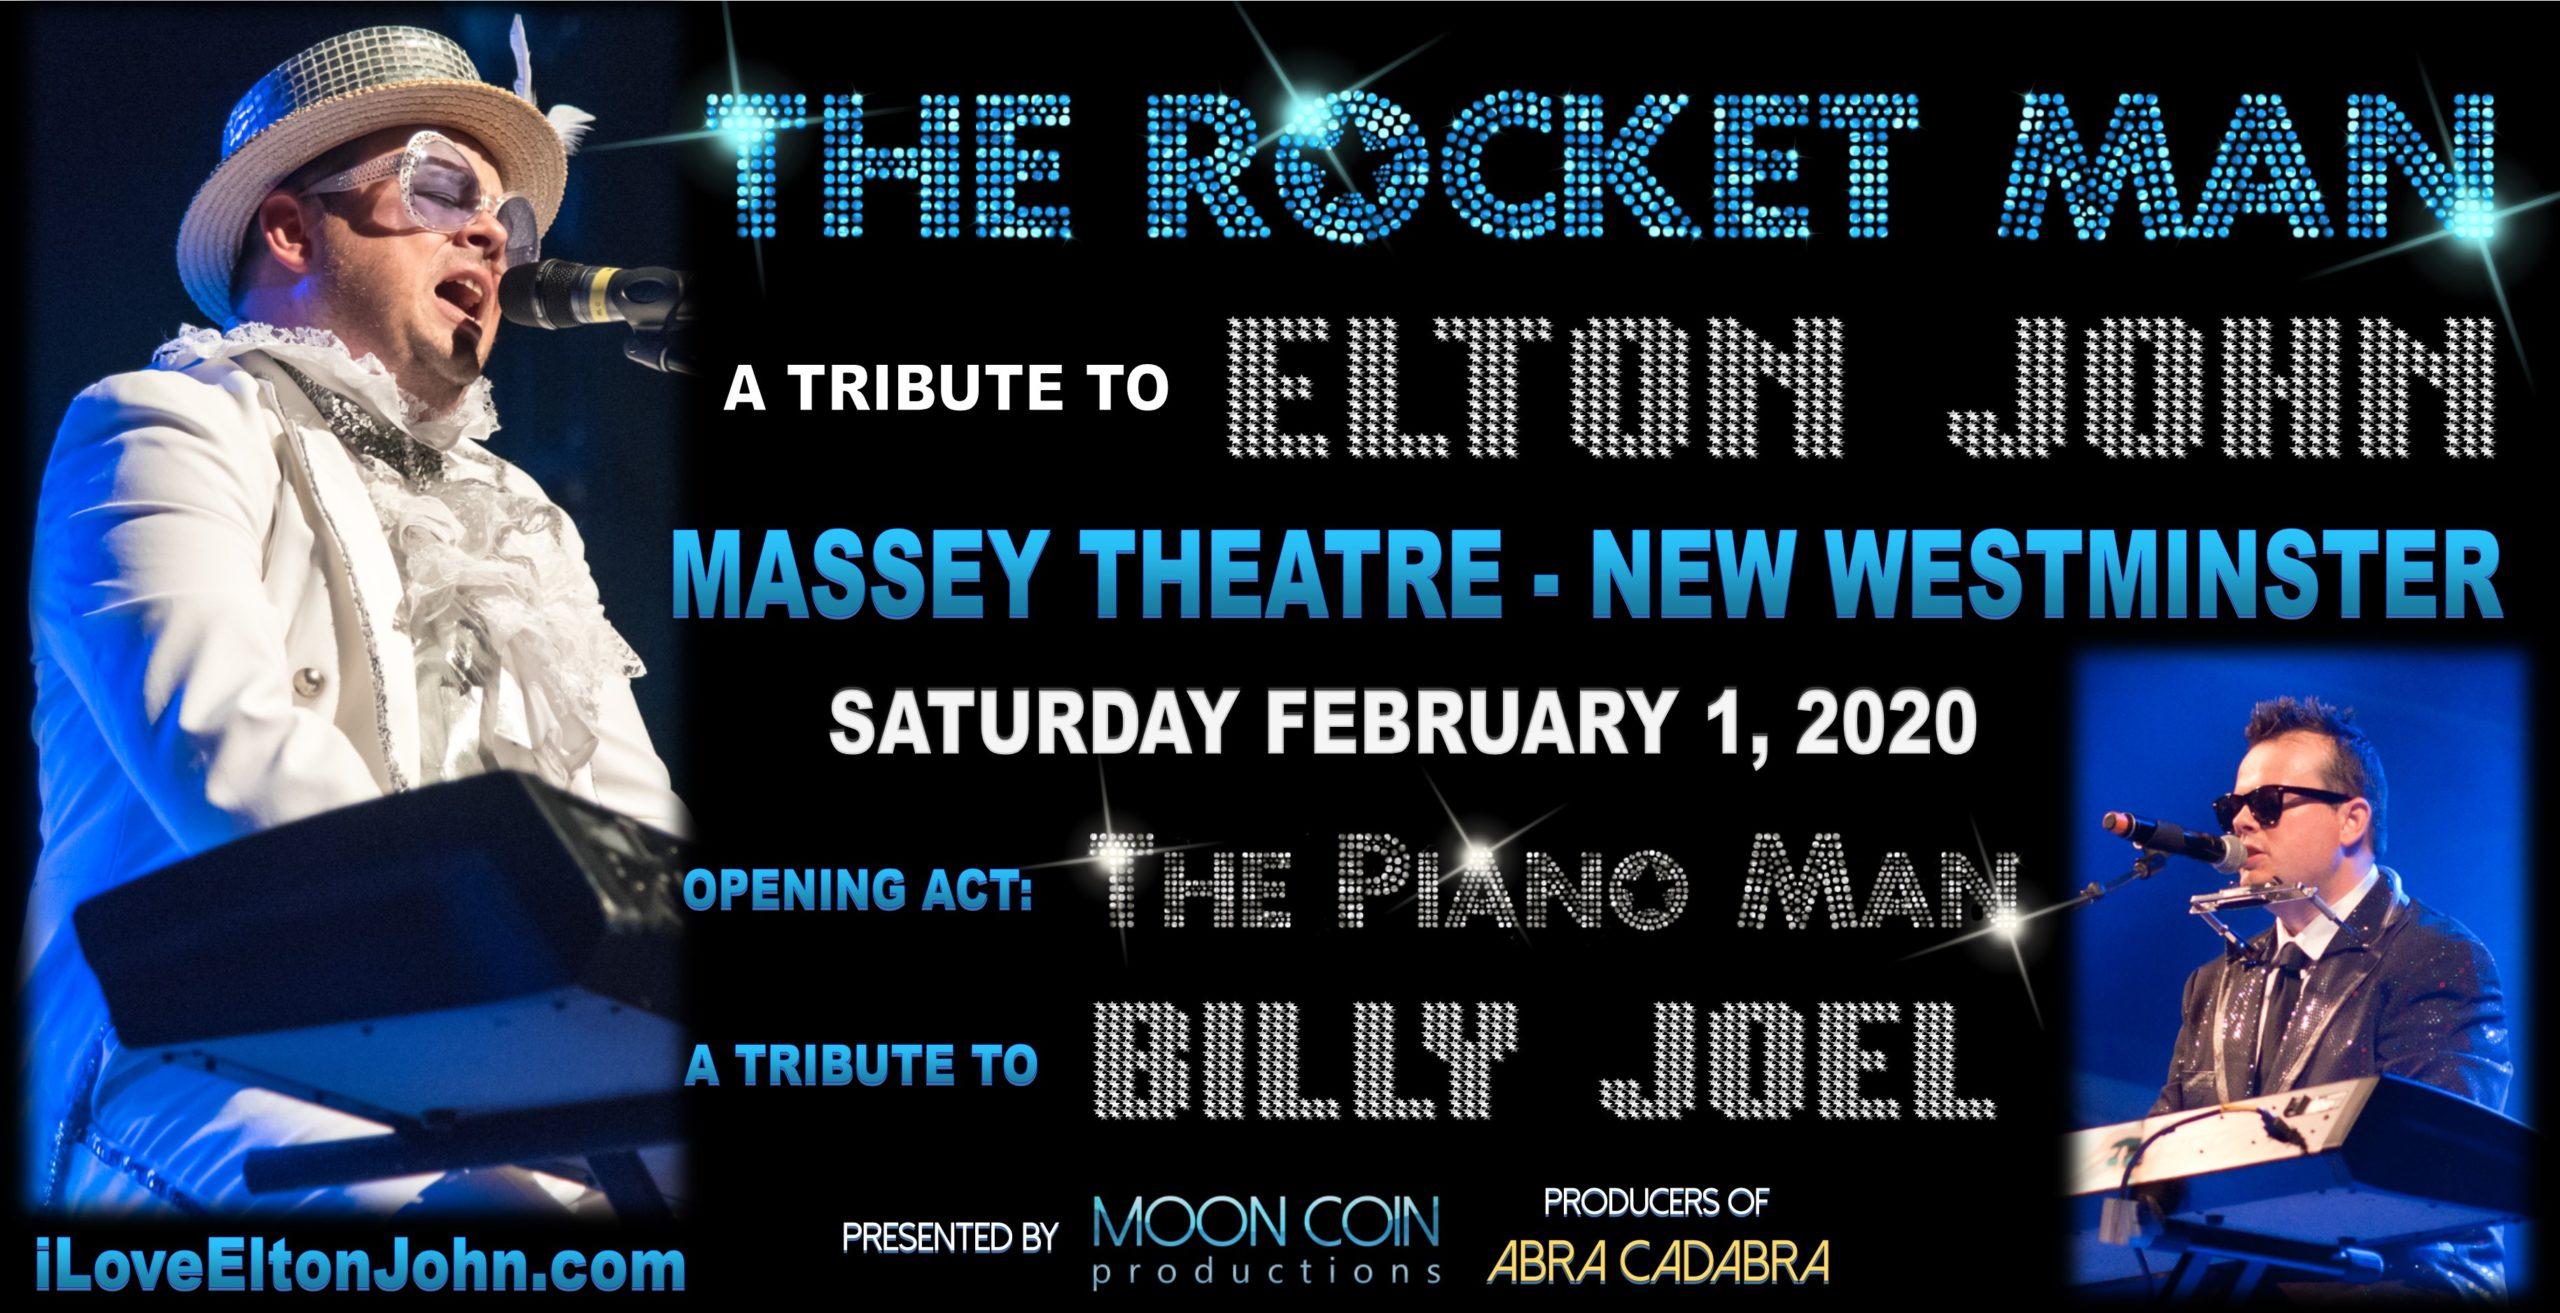 The Rocket Man: A Tribute to Elton John